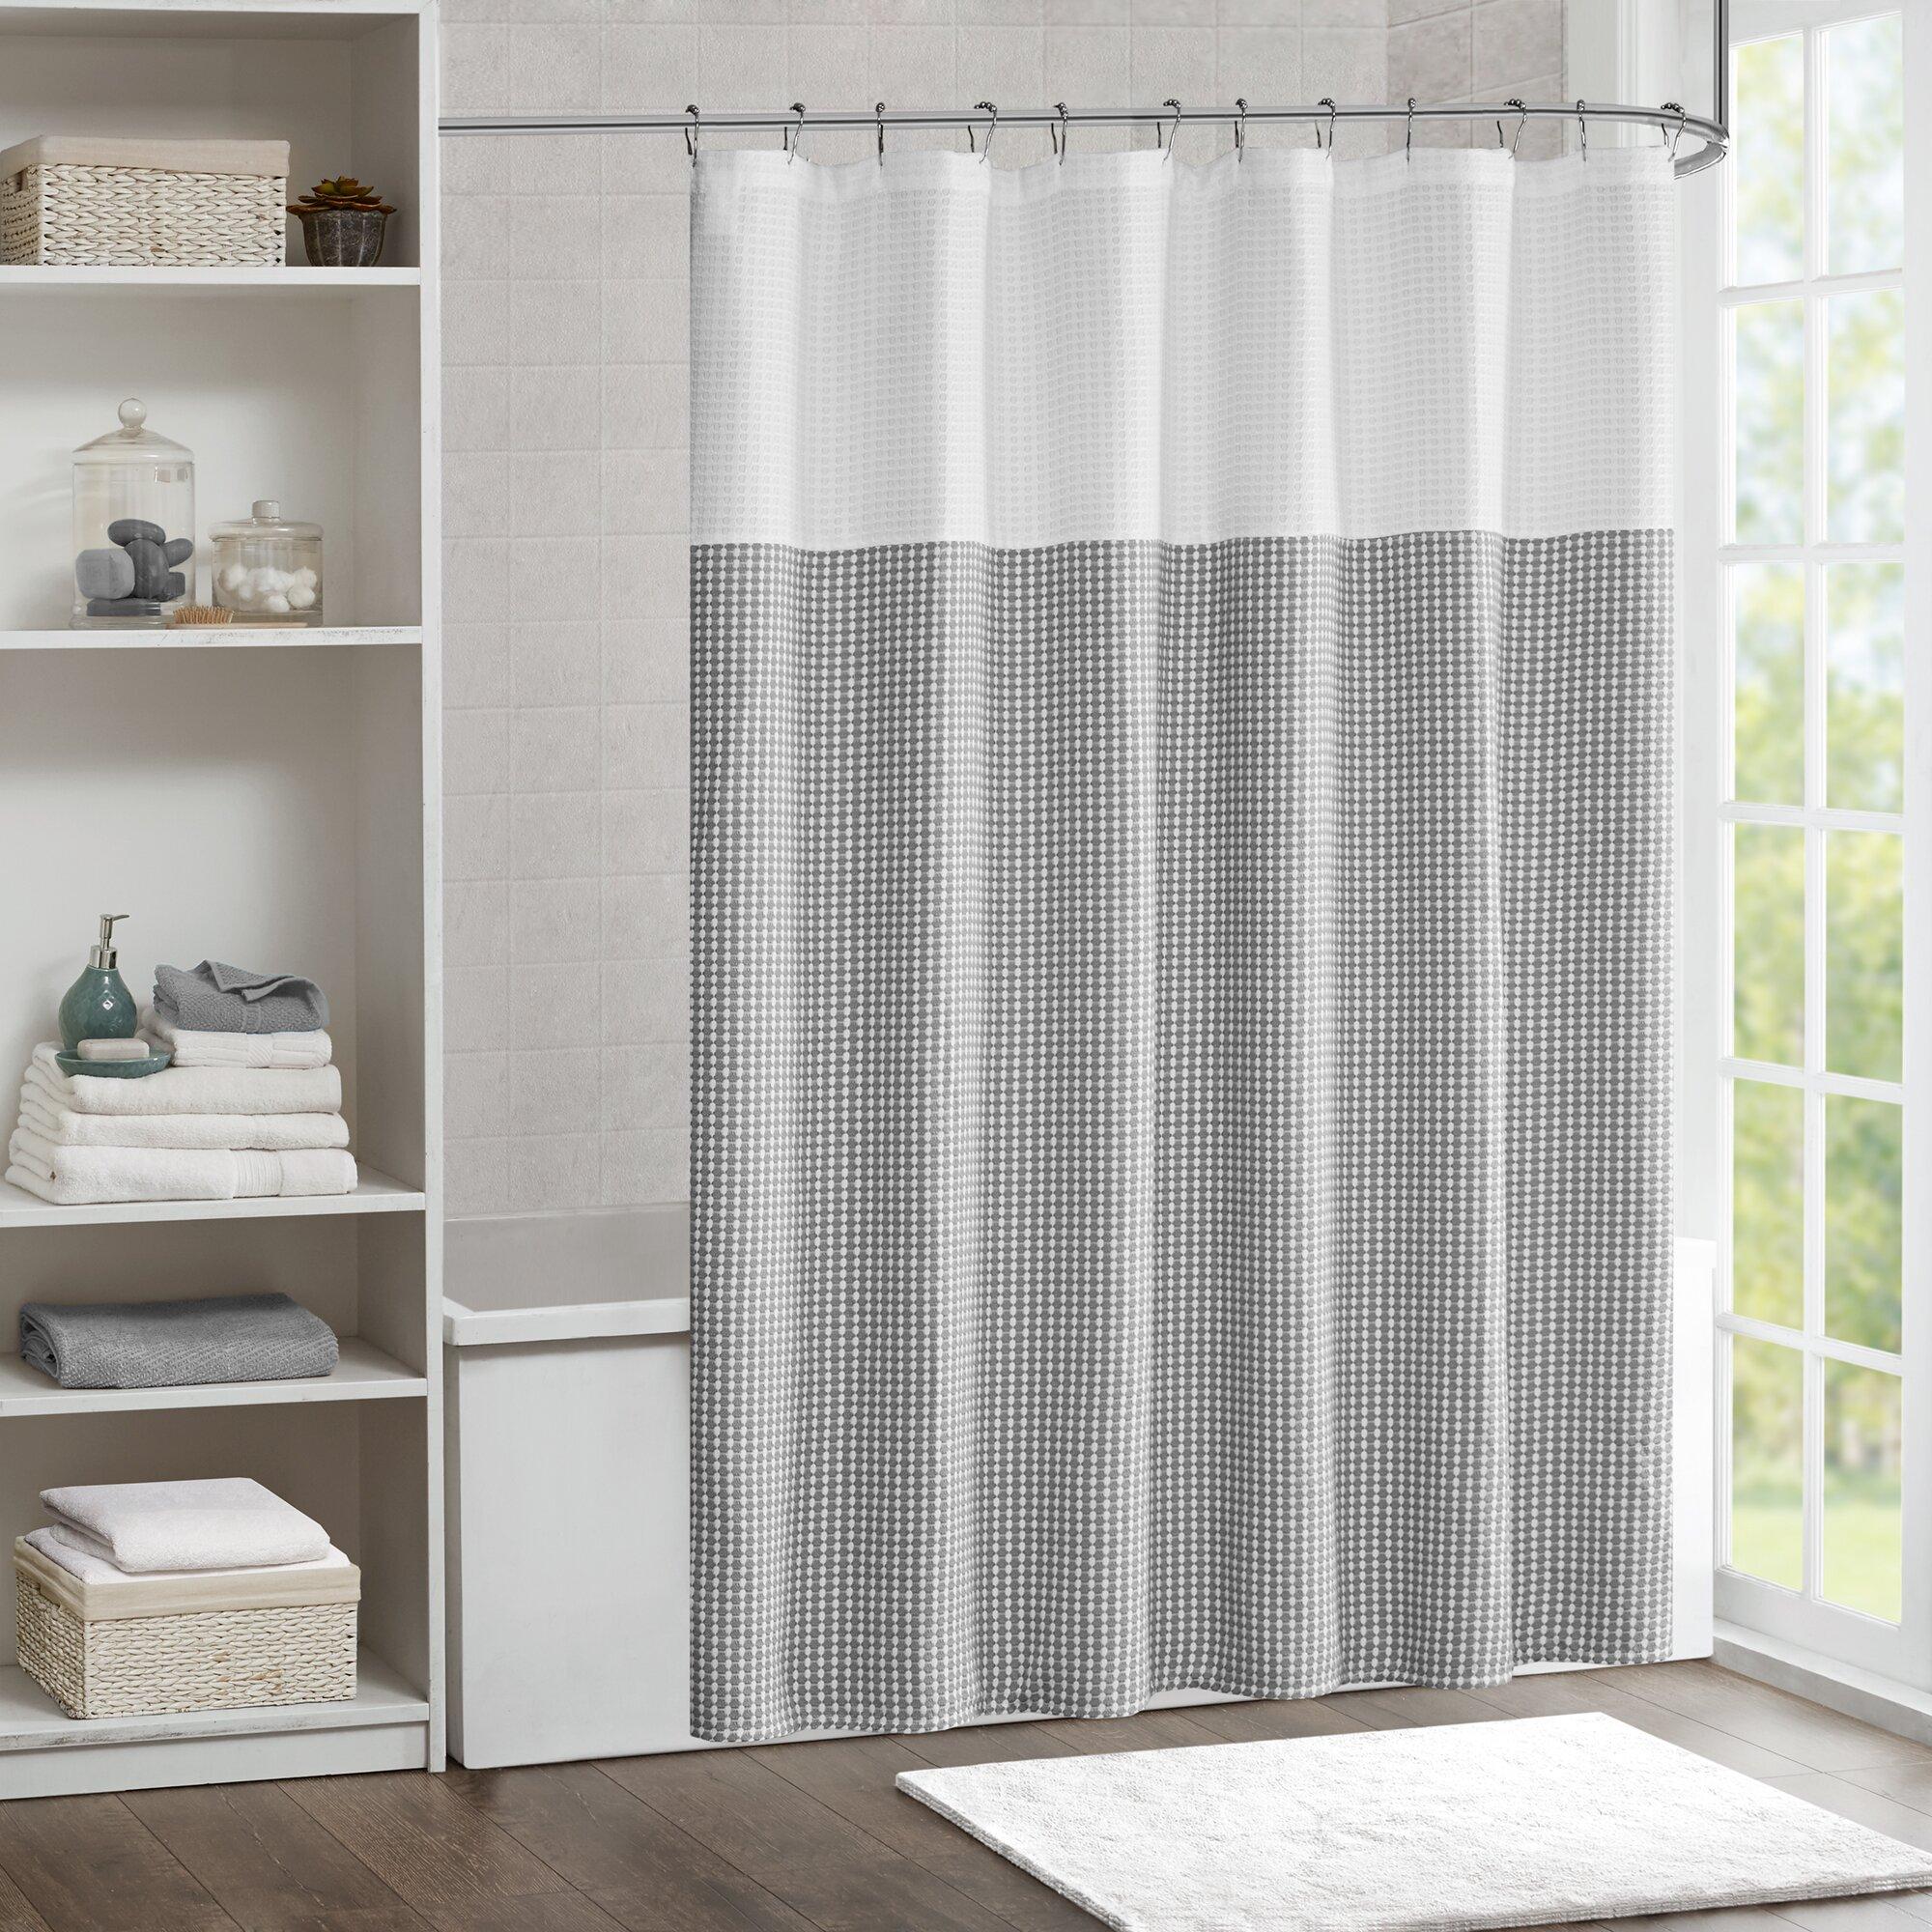 Laurel Foundry Modern Farmhouse Moreland Shower Curtain Reviews Wayfair